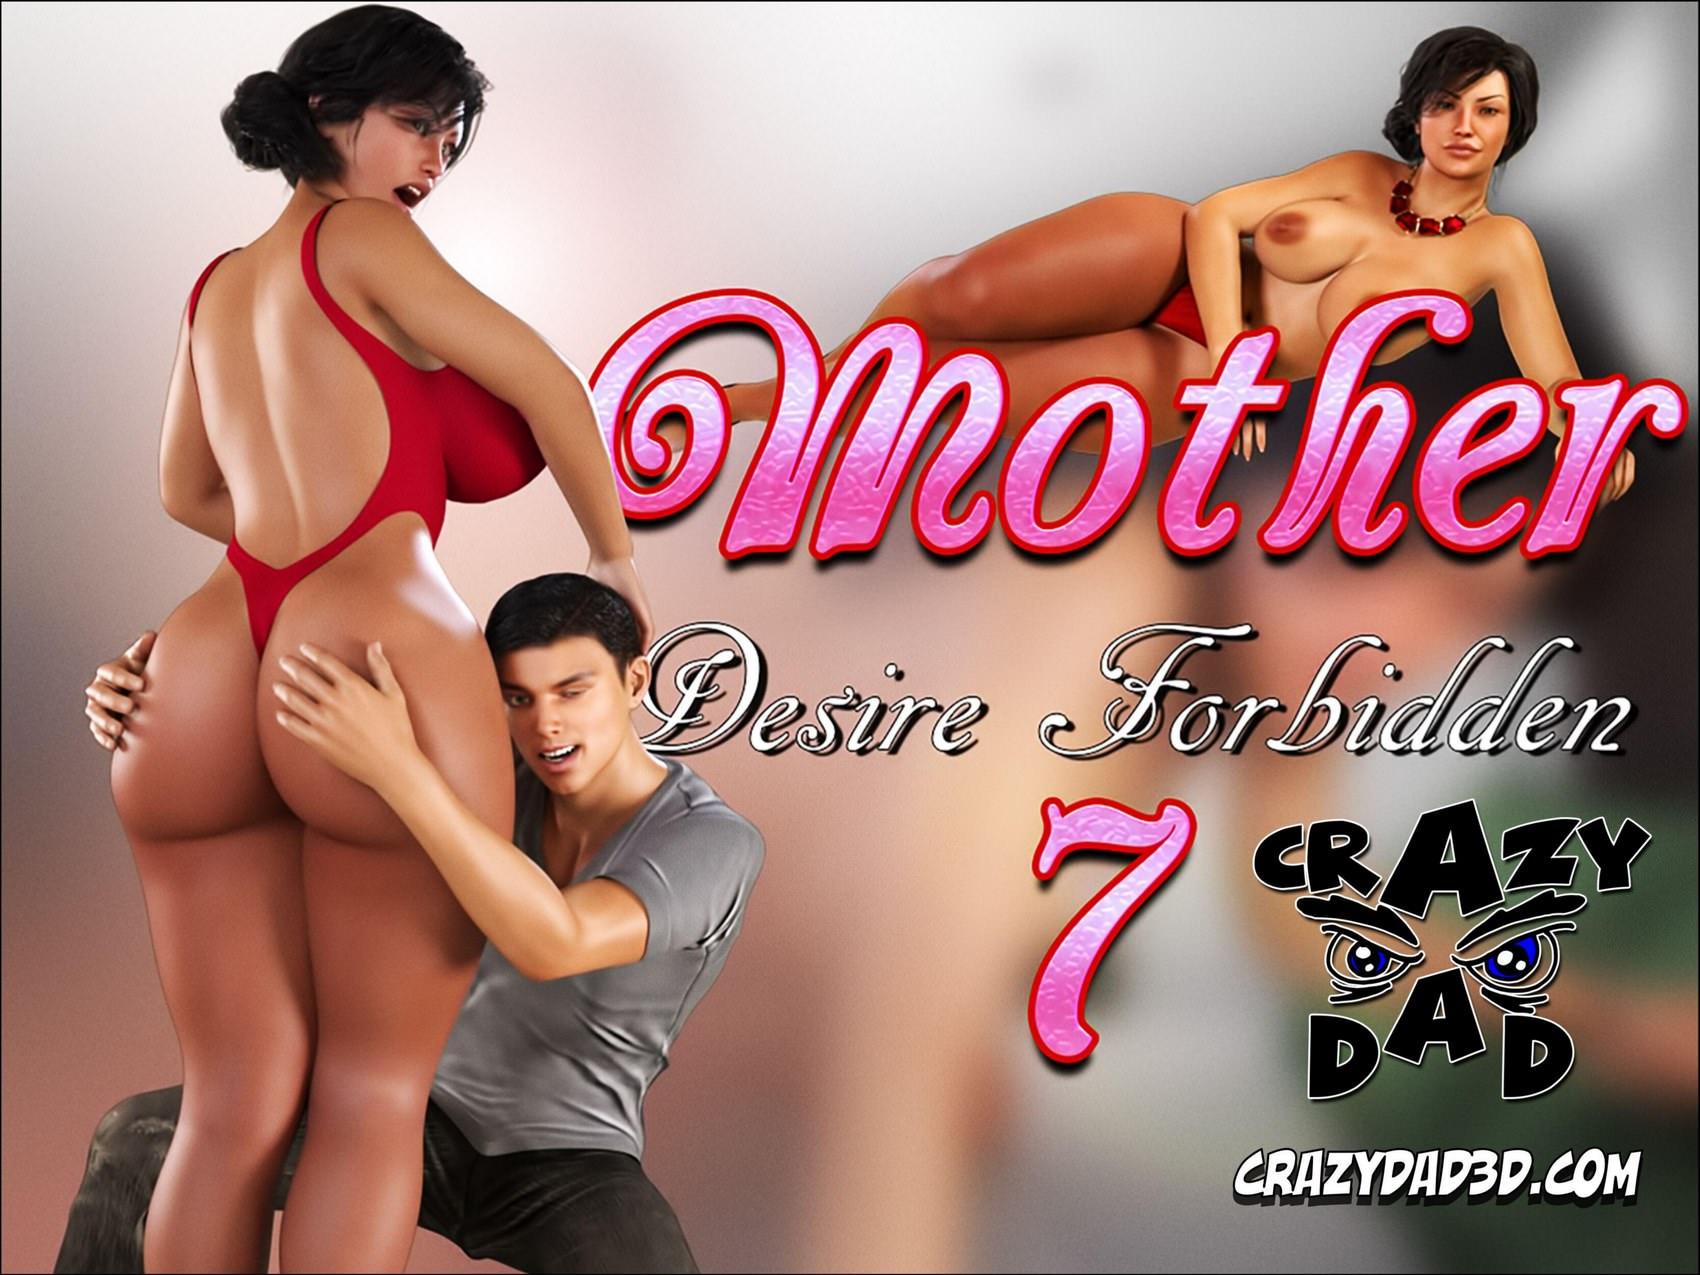 Animal Forbidden Porn mother - desire forbidden 7 - 3d, porn comics online at